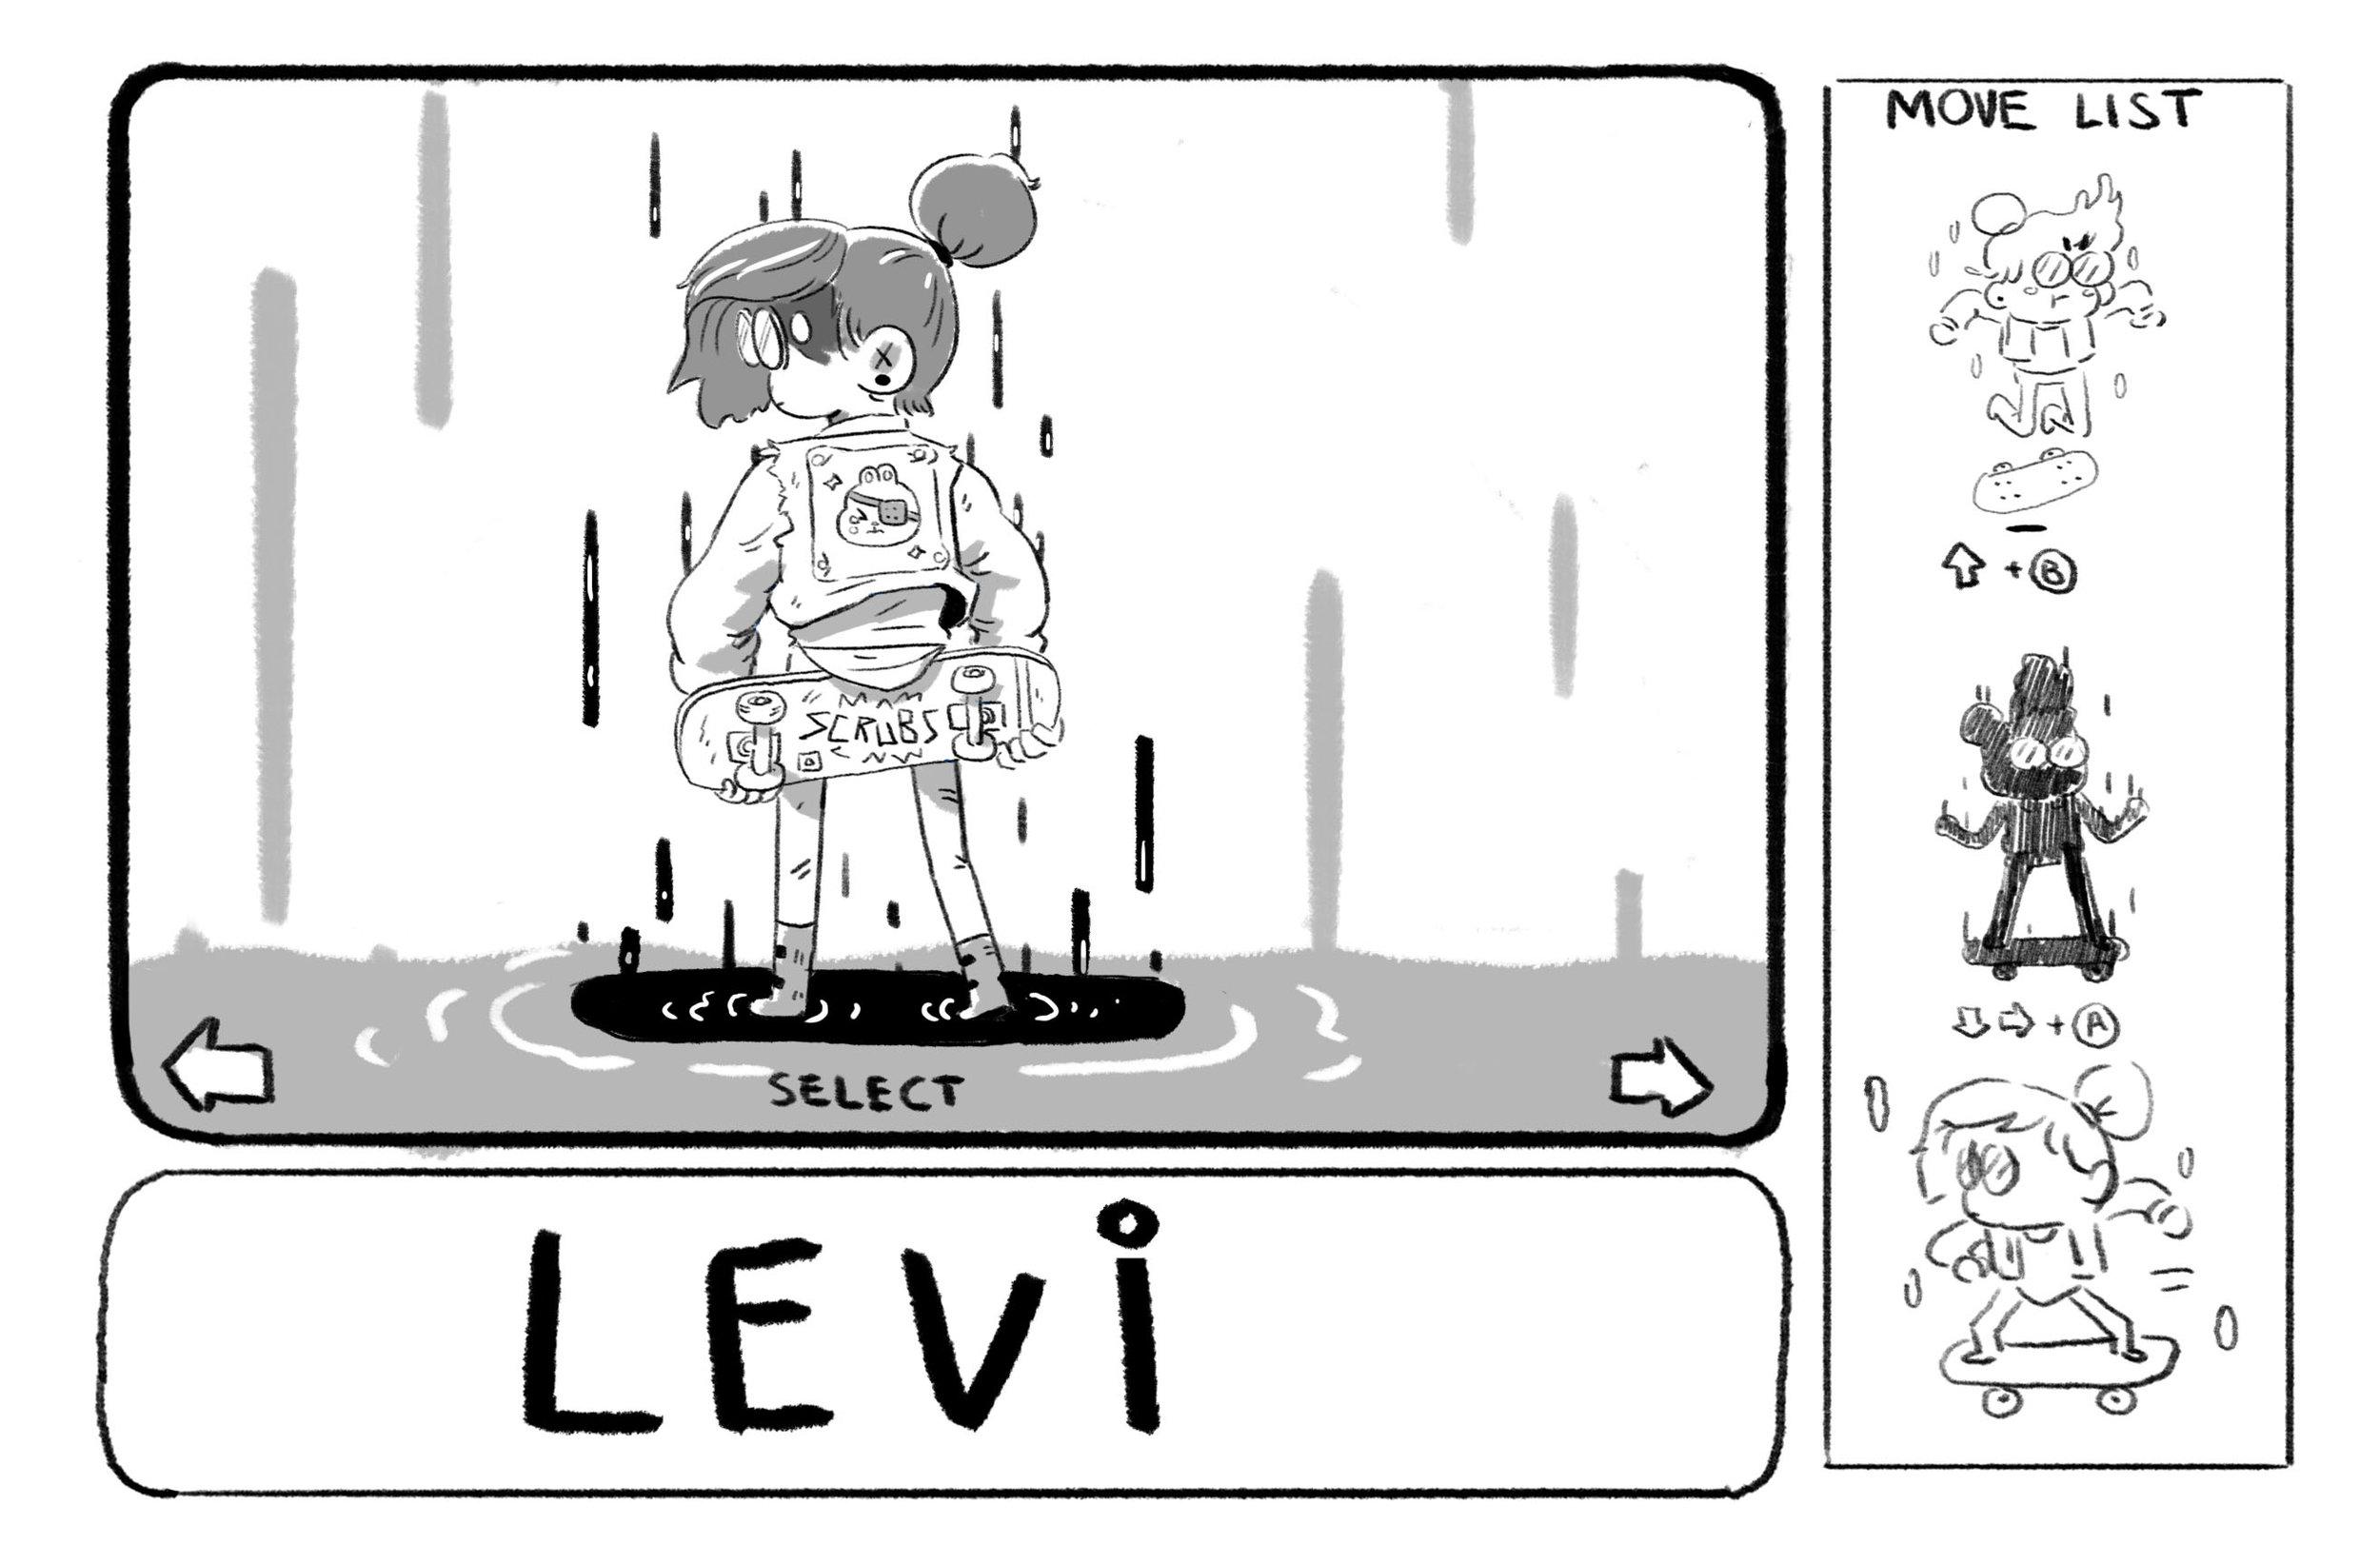 hero_0004_Layer Comp 5.jpg